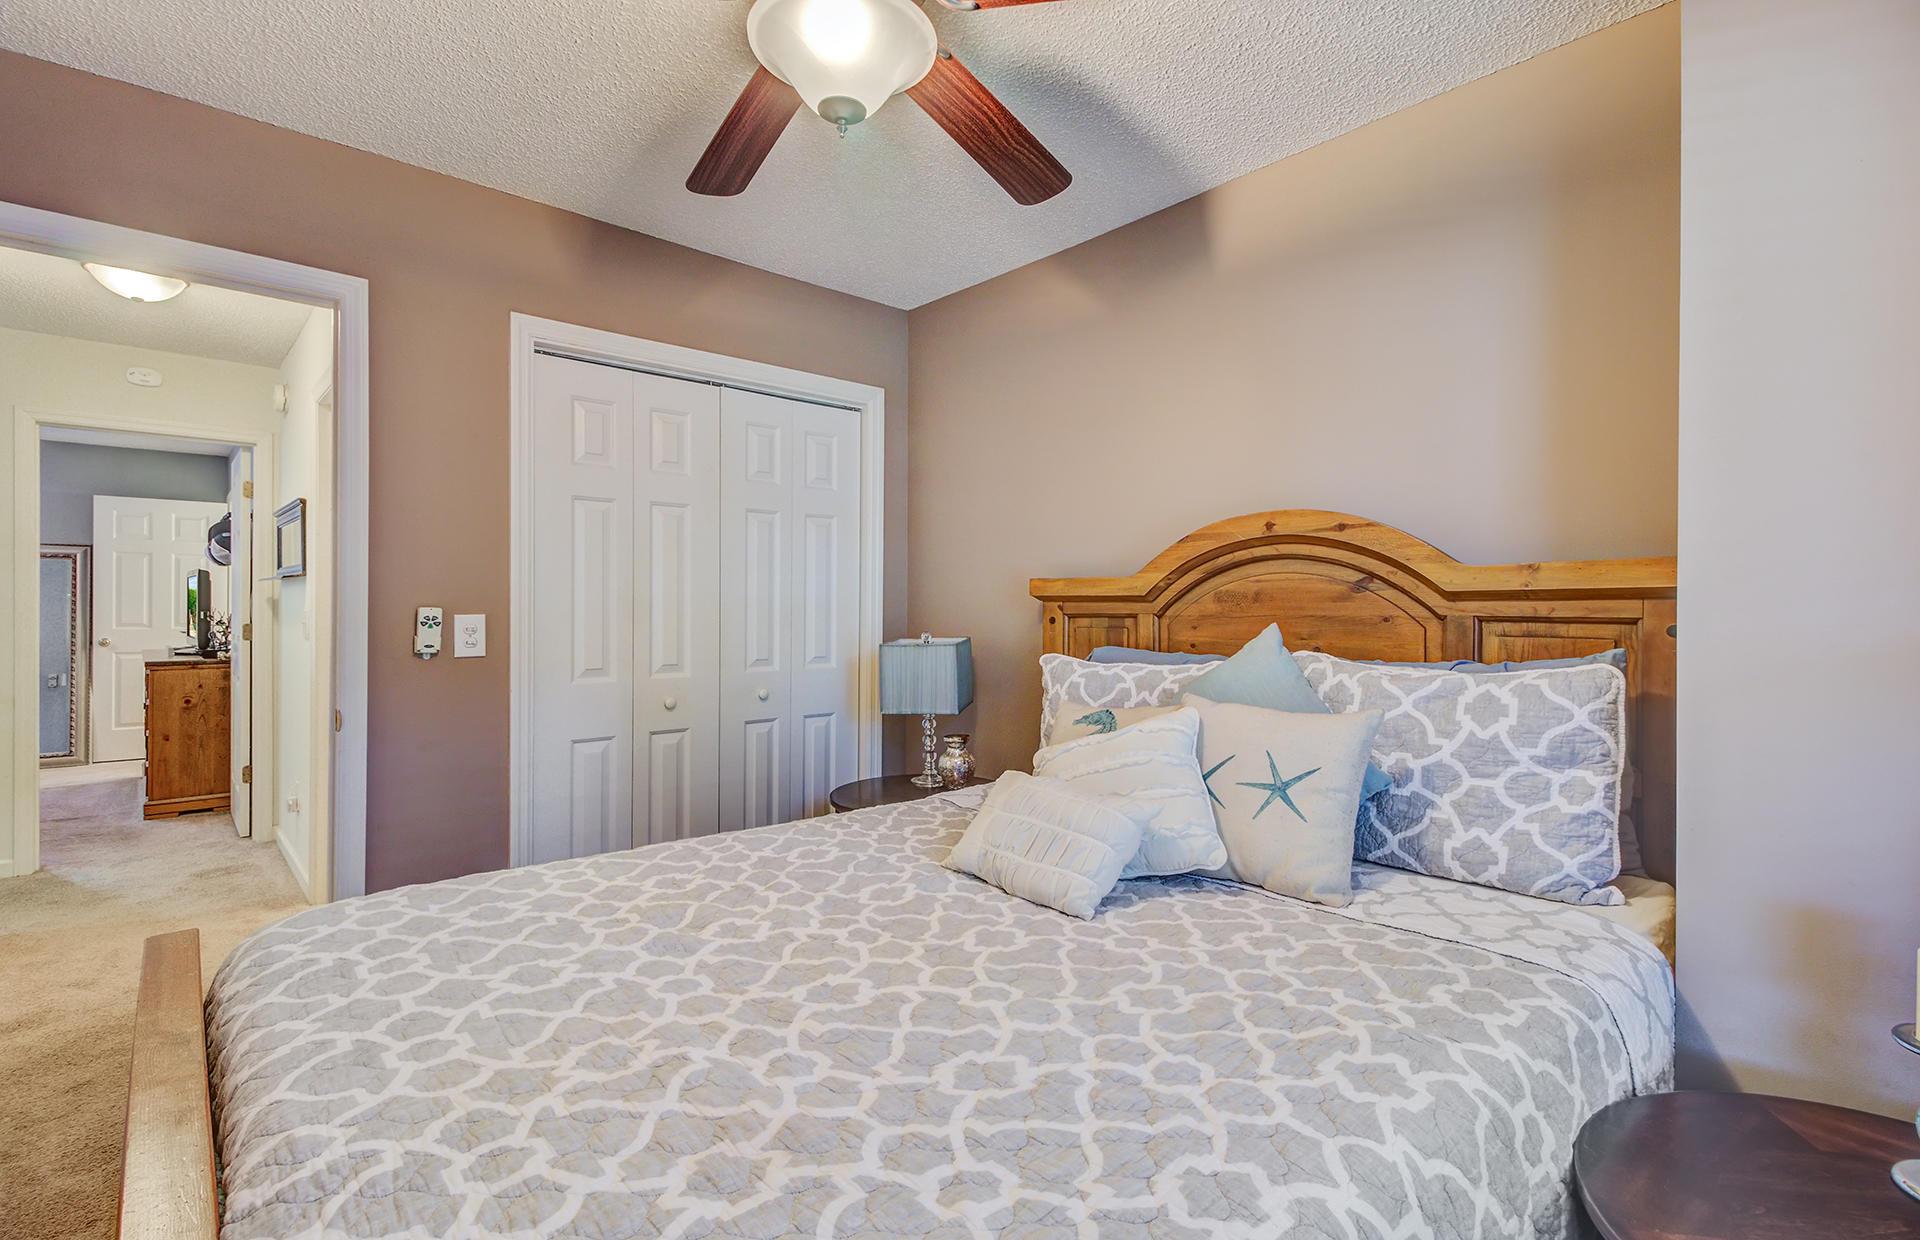 Wando East Homes For Sale - 1664 Hunters Run, Mount Pleasant, SC - 16